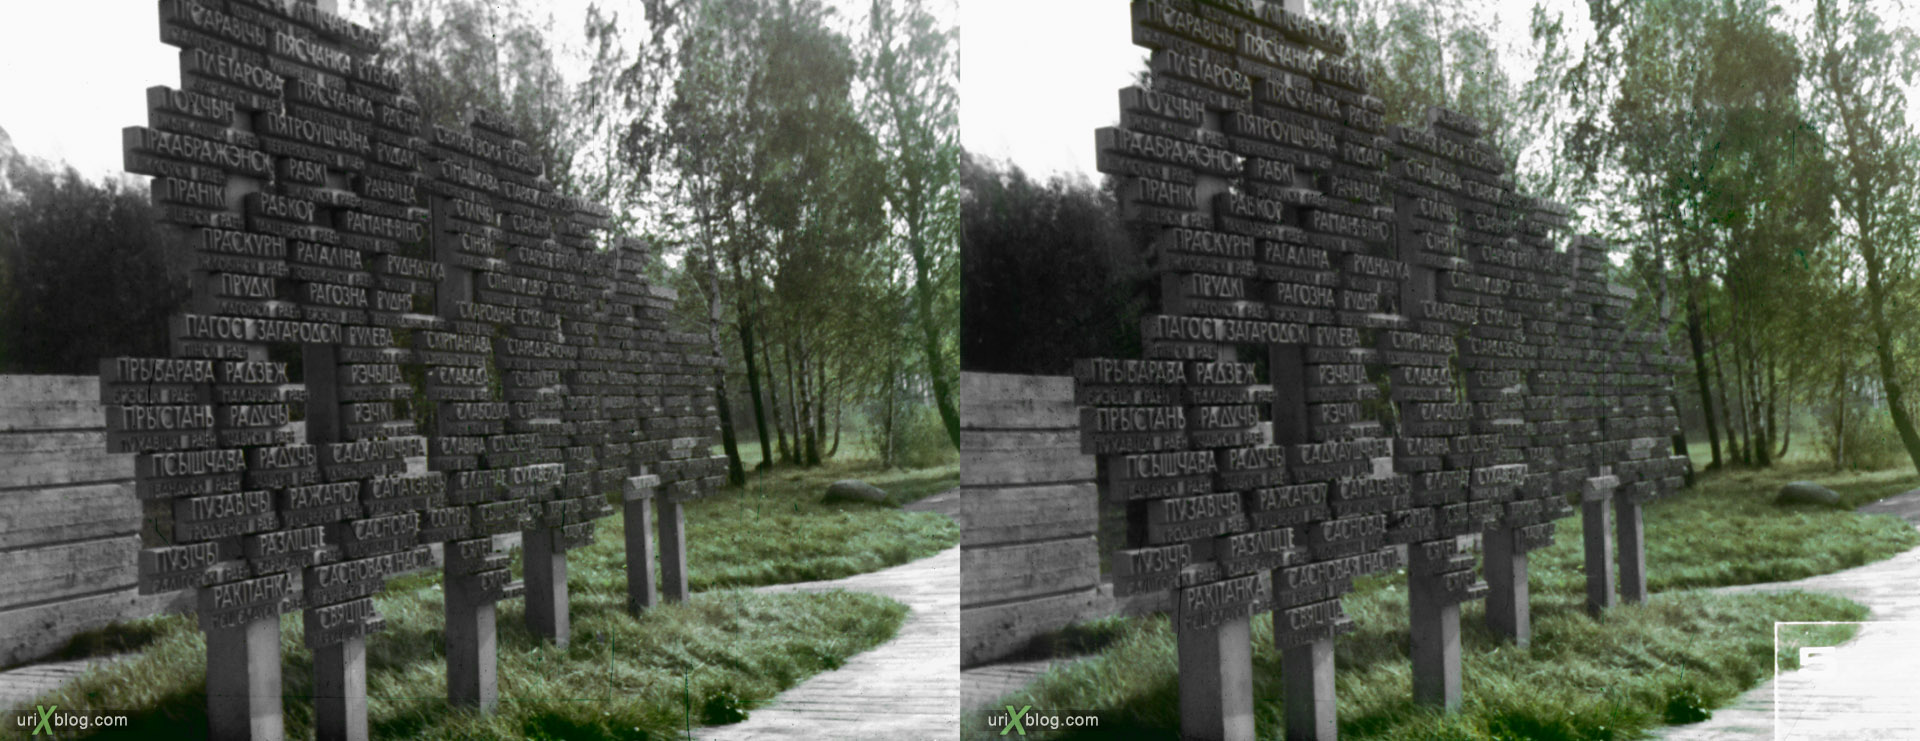 1978, Khatyn Memorial, Belorussia, film, 3D, stereo pair, cross-eyed, crossview, cross view stereo pair, stereoscopic